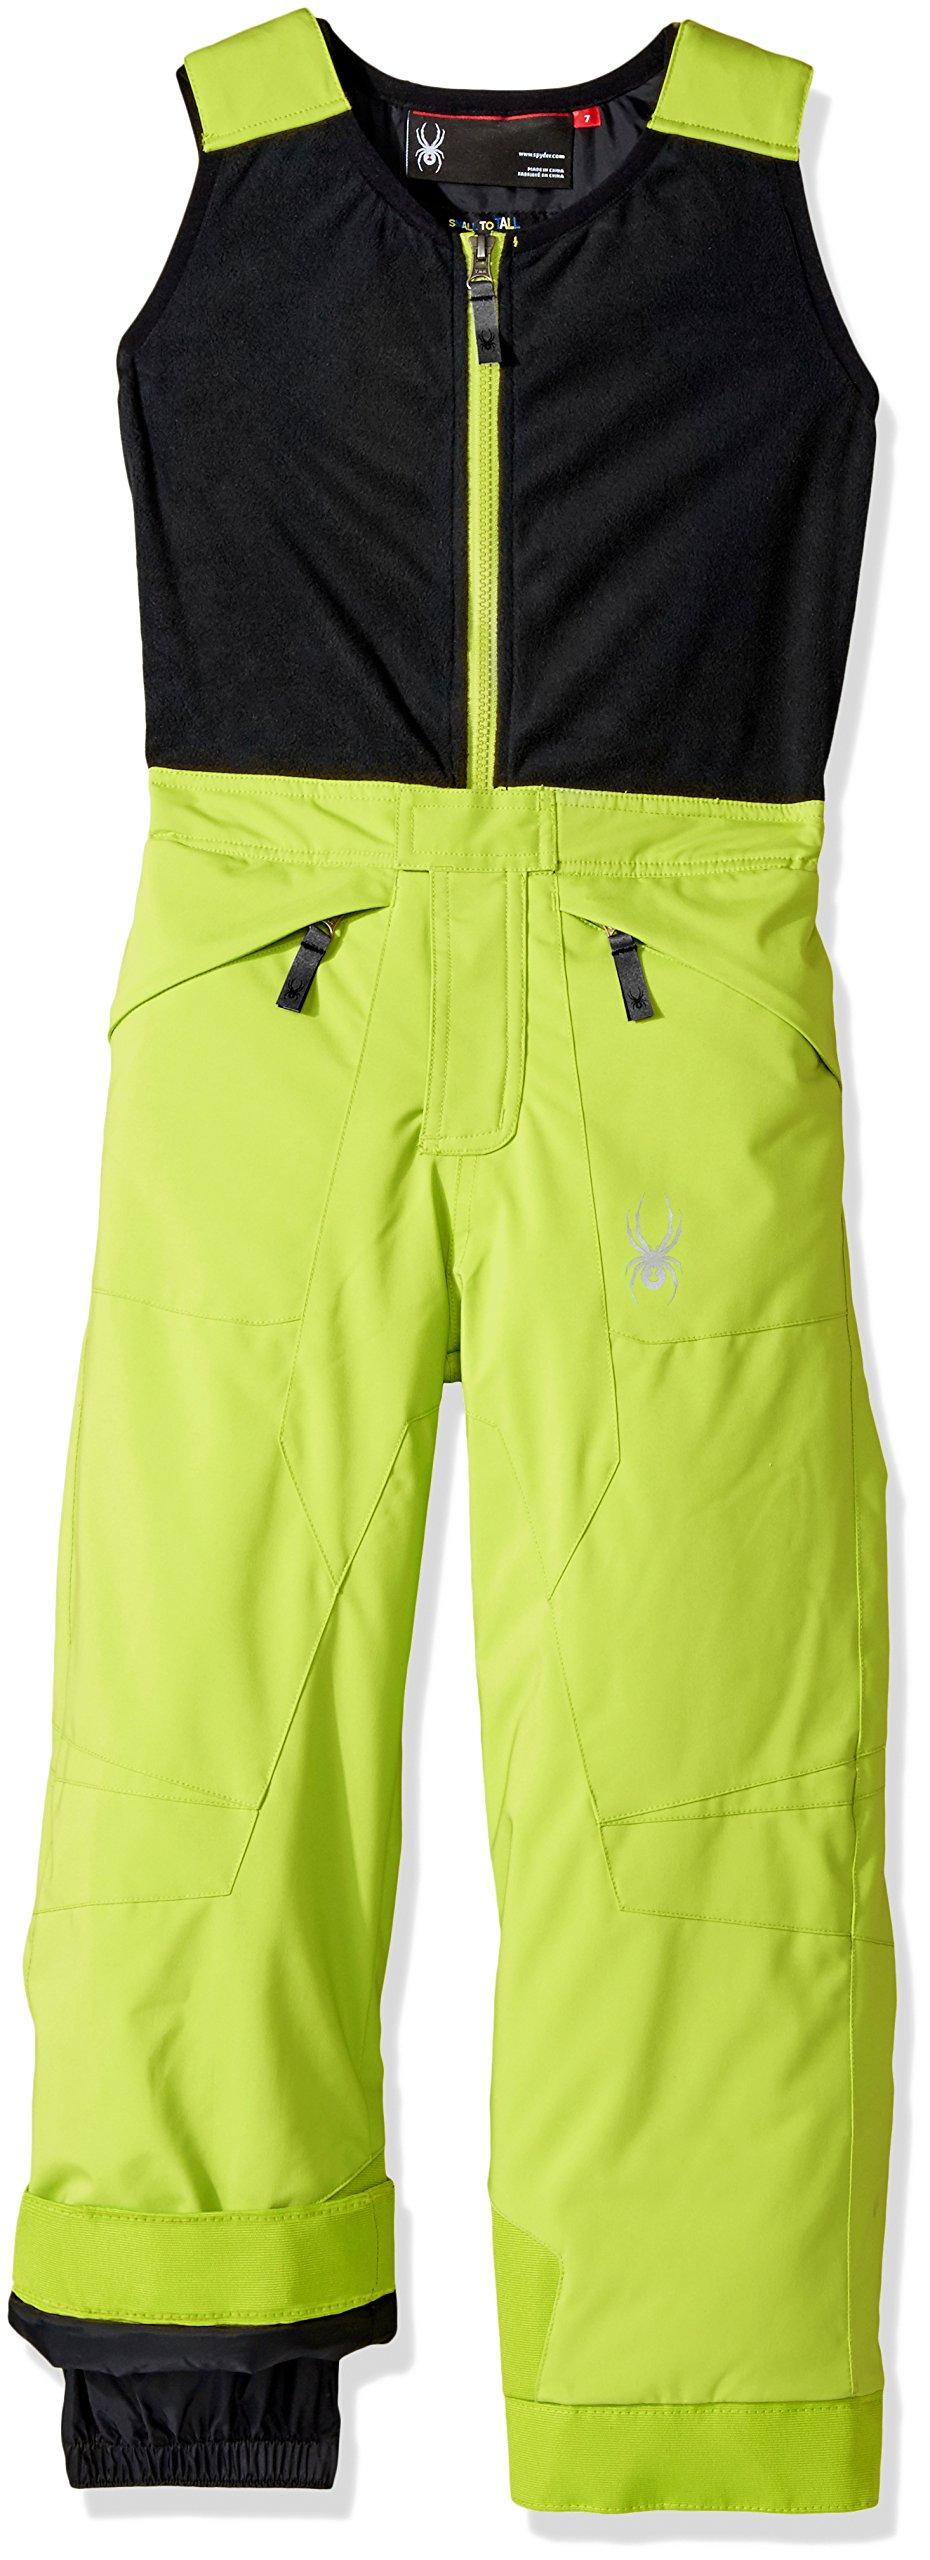 Spyder Mini Expedition Ski Pant, Bright Yellow/Black, Size 4 by Spyder